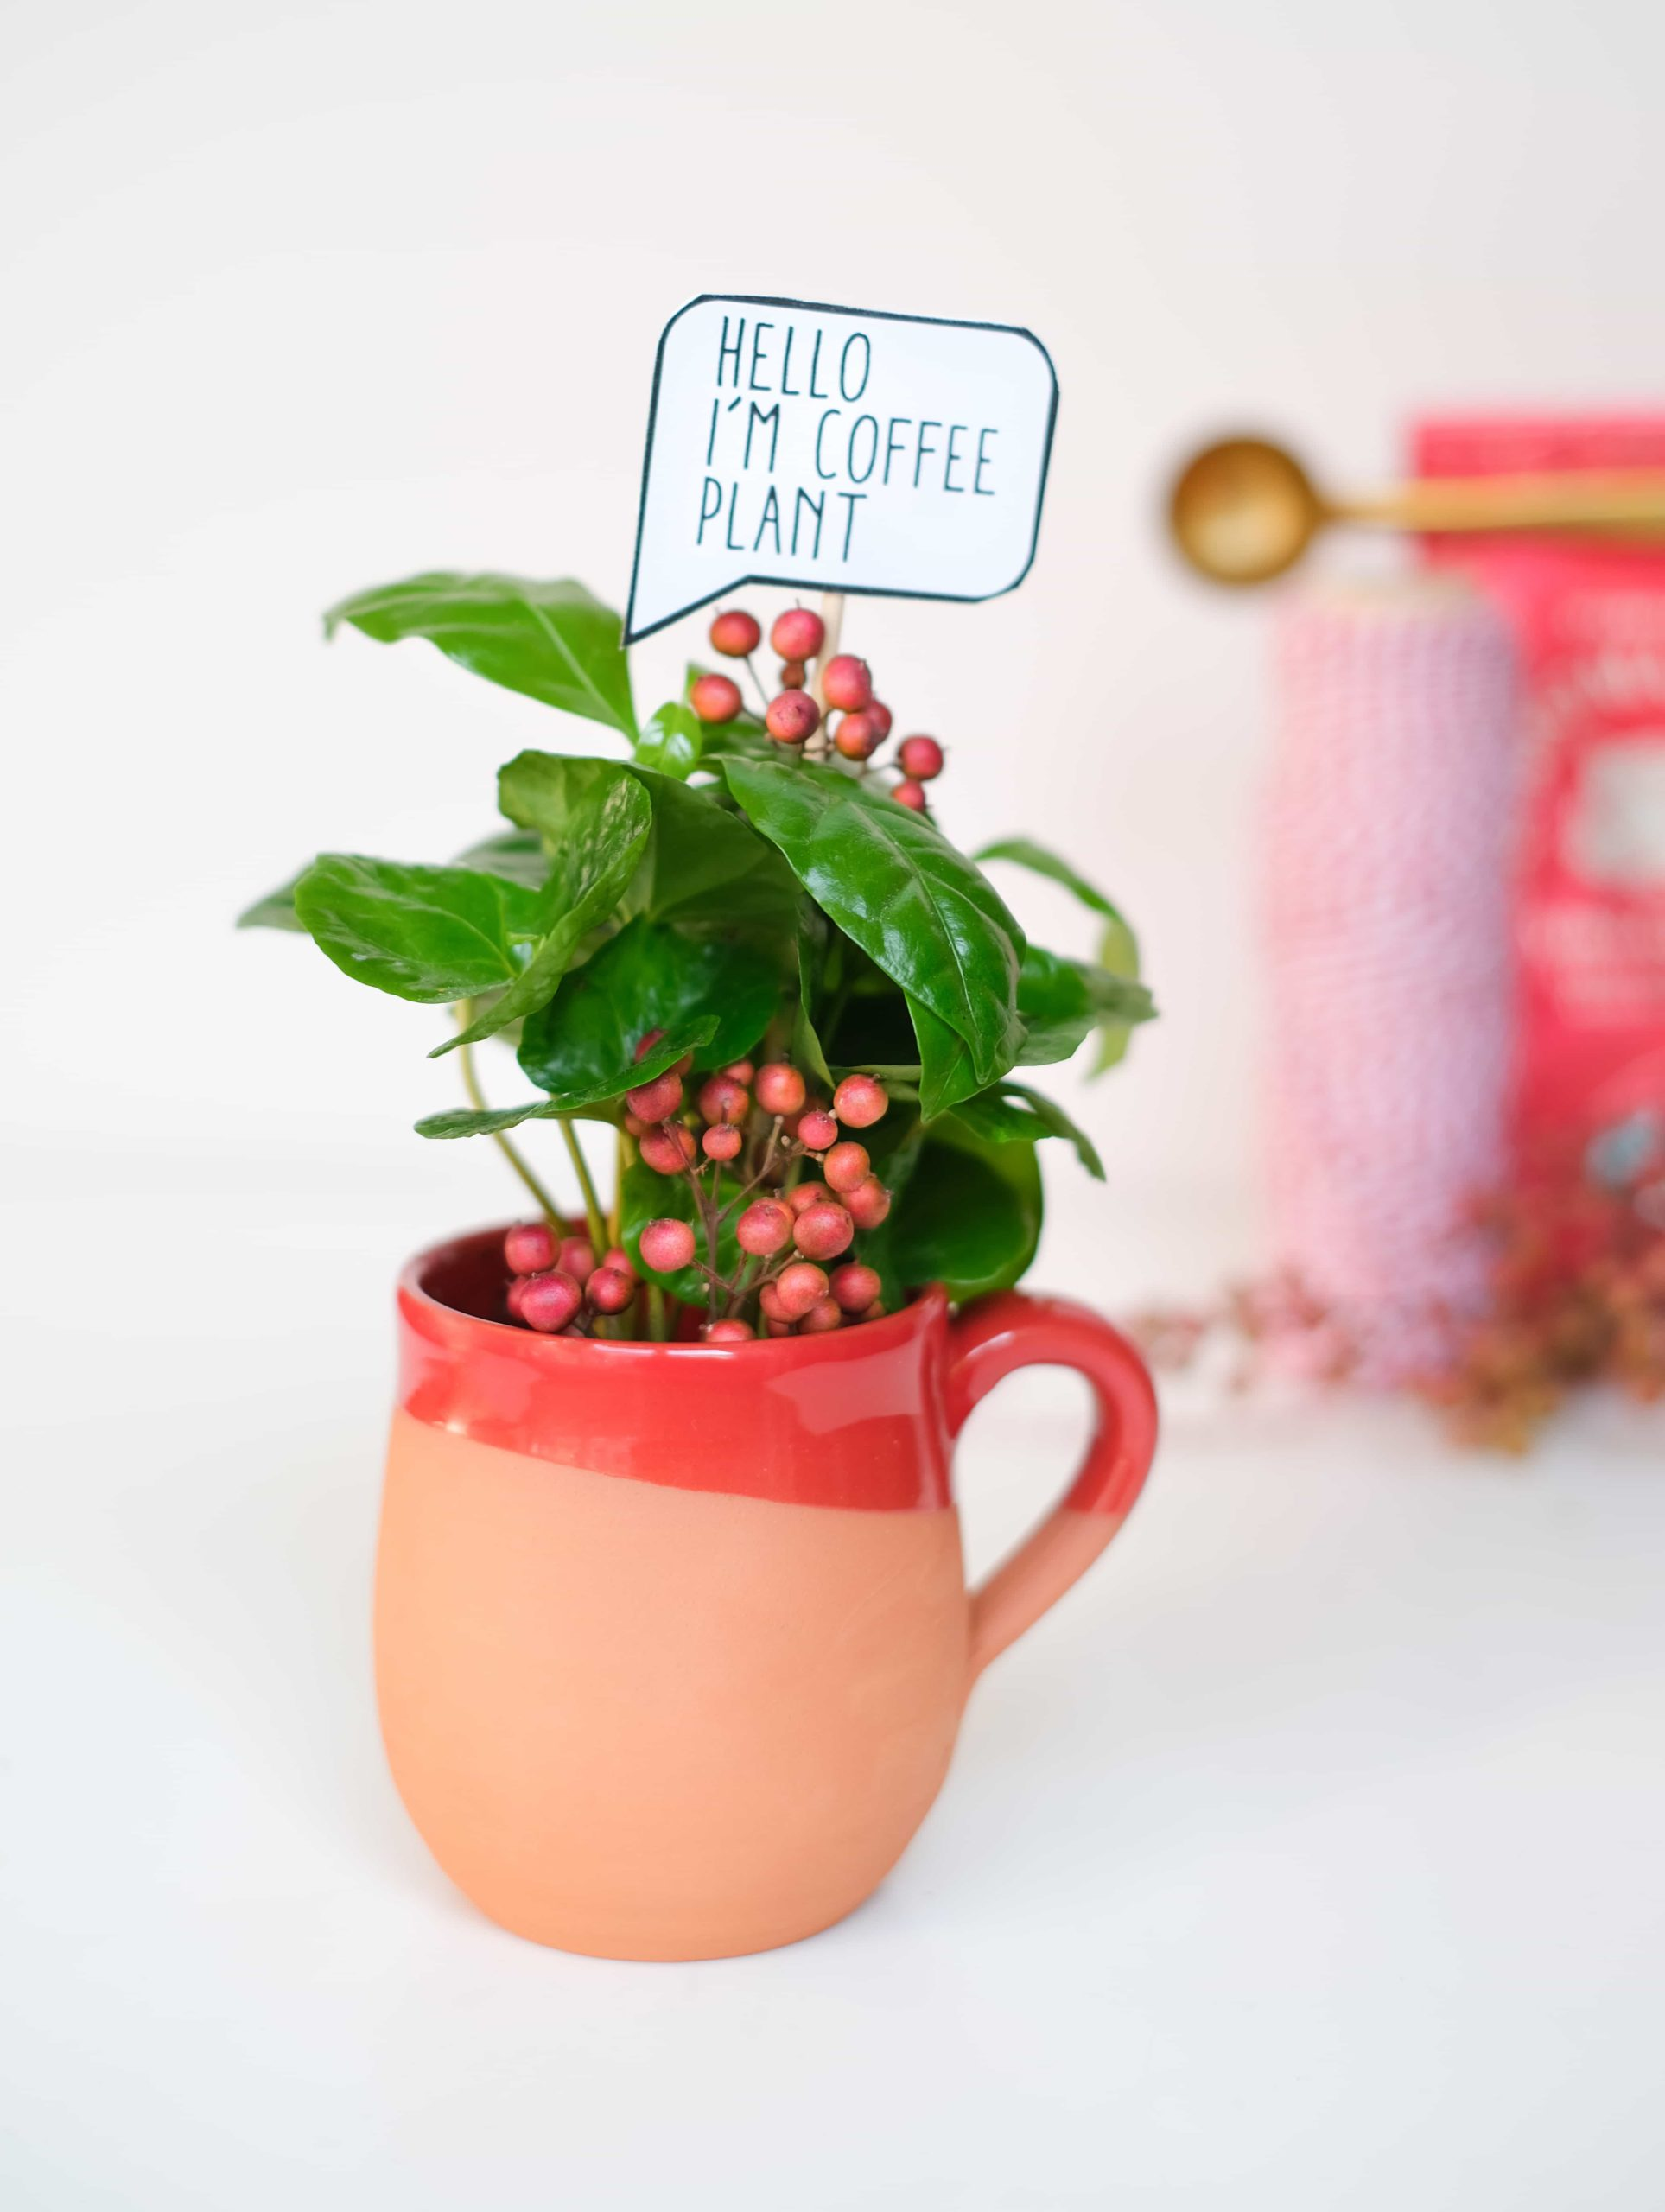 Coffea Arabica Kahve Bitkisi Coffee plant Mug